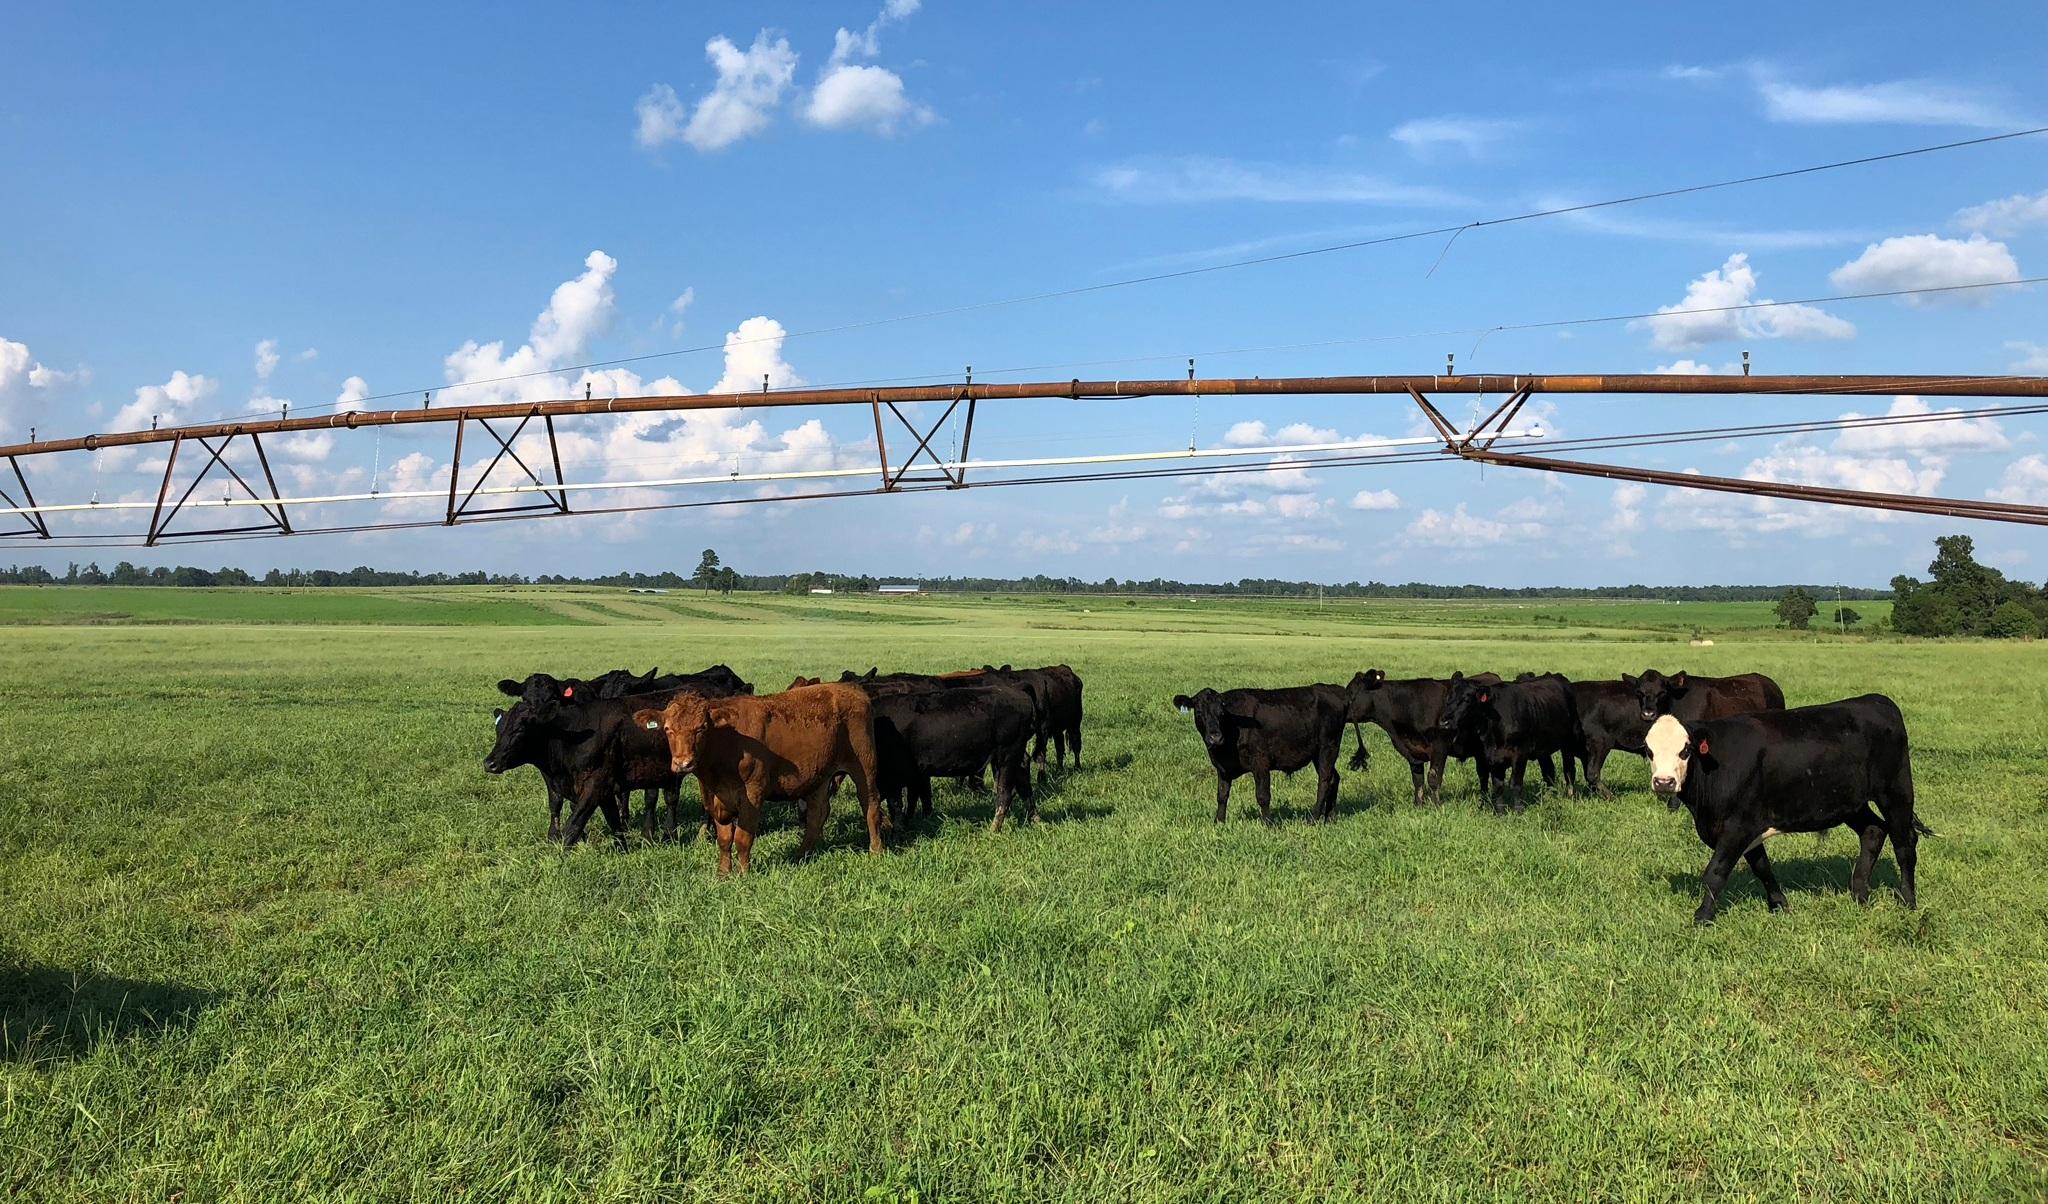 Grassfed cattle at Blackdirt Farms, a farming operation on Harvest Return's platform.